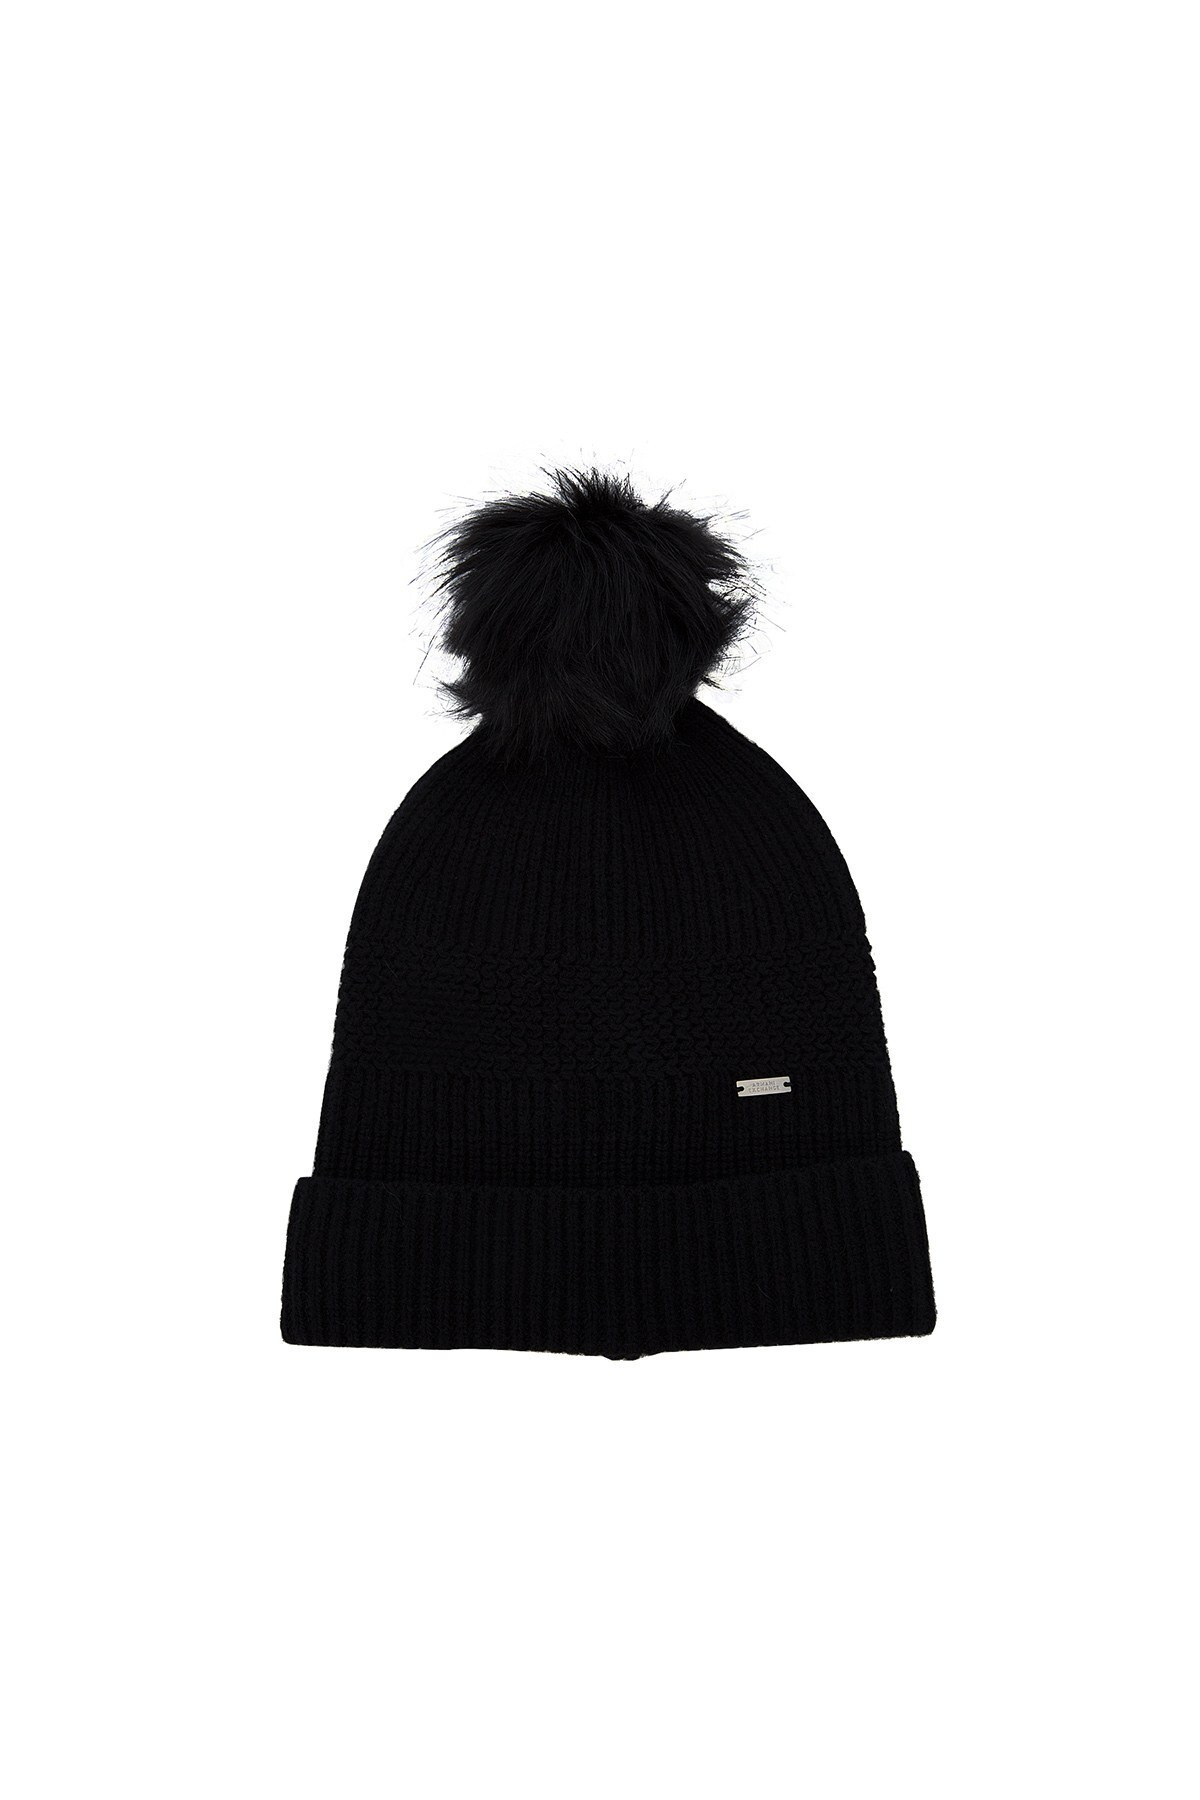 Armani Exchange Kadın Şapka 6GY41D YMS3Z 1200 SİYAH